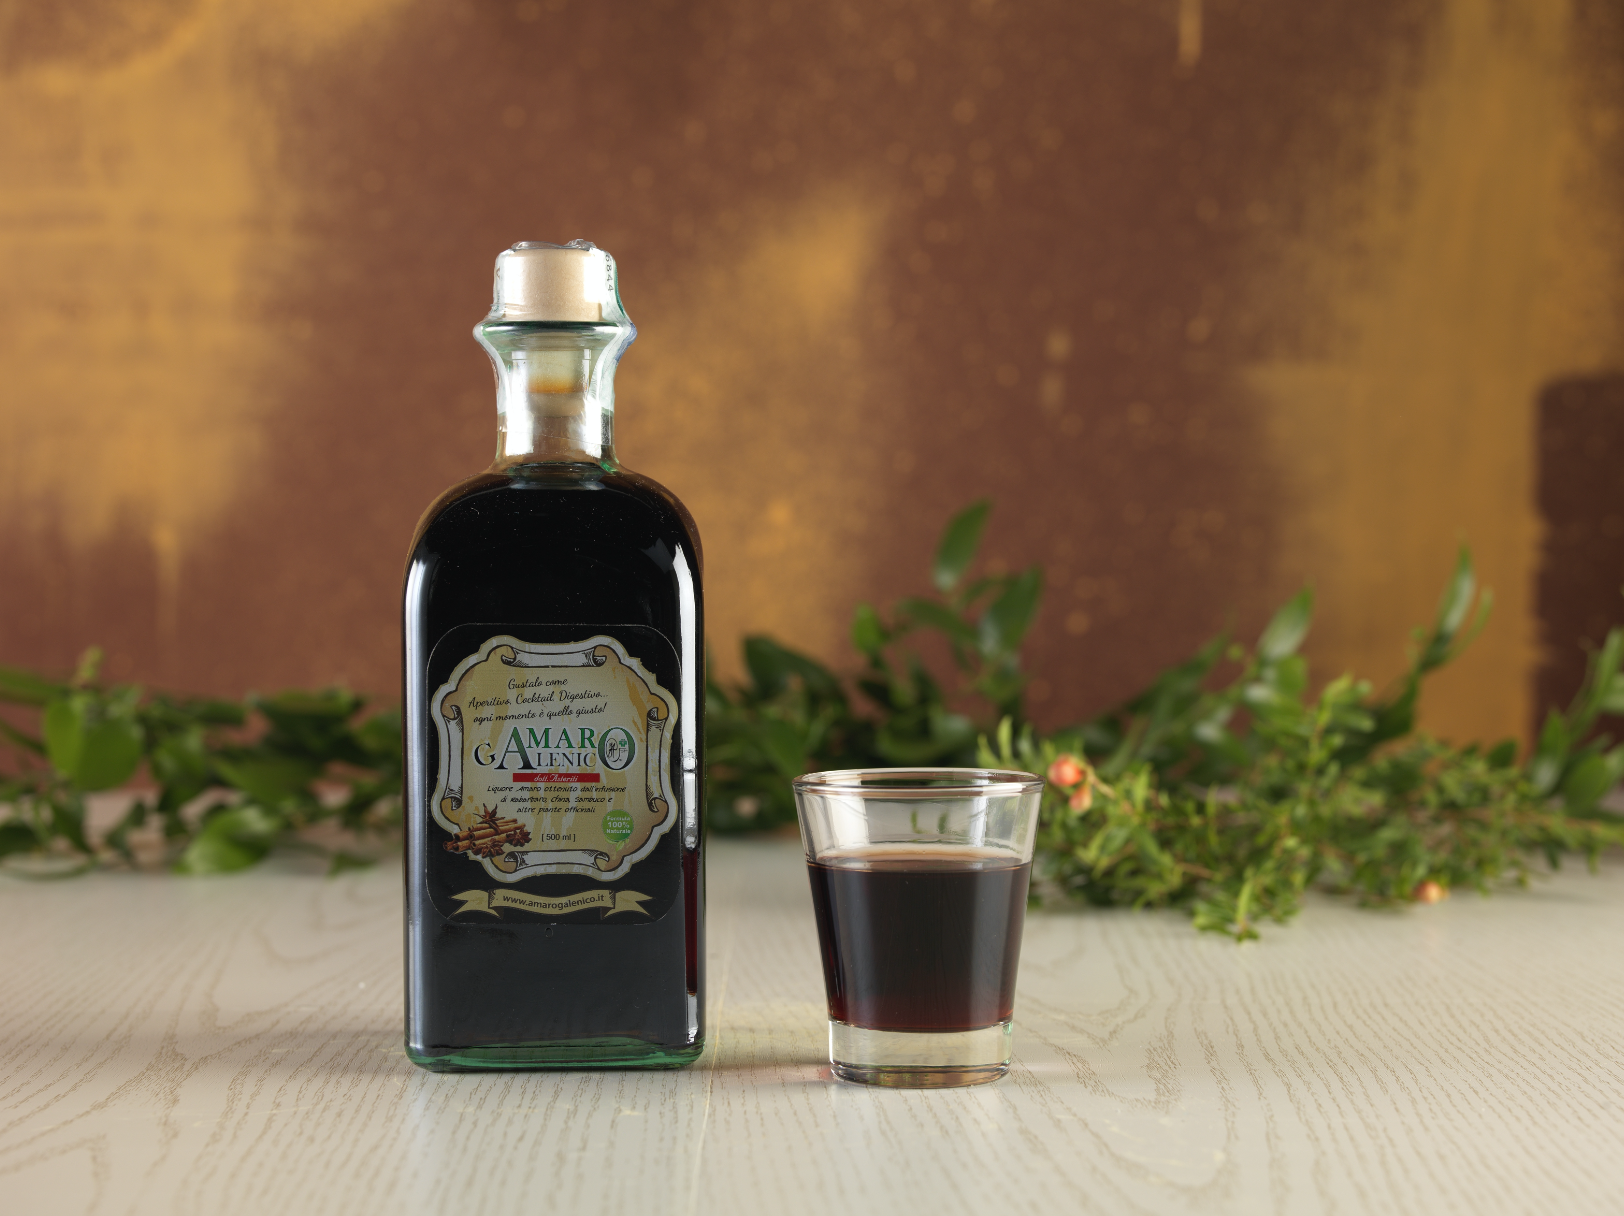 Amaro Galenico Image